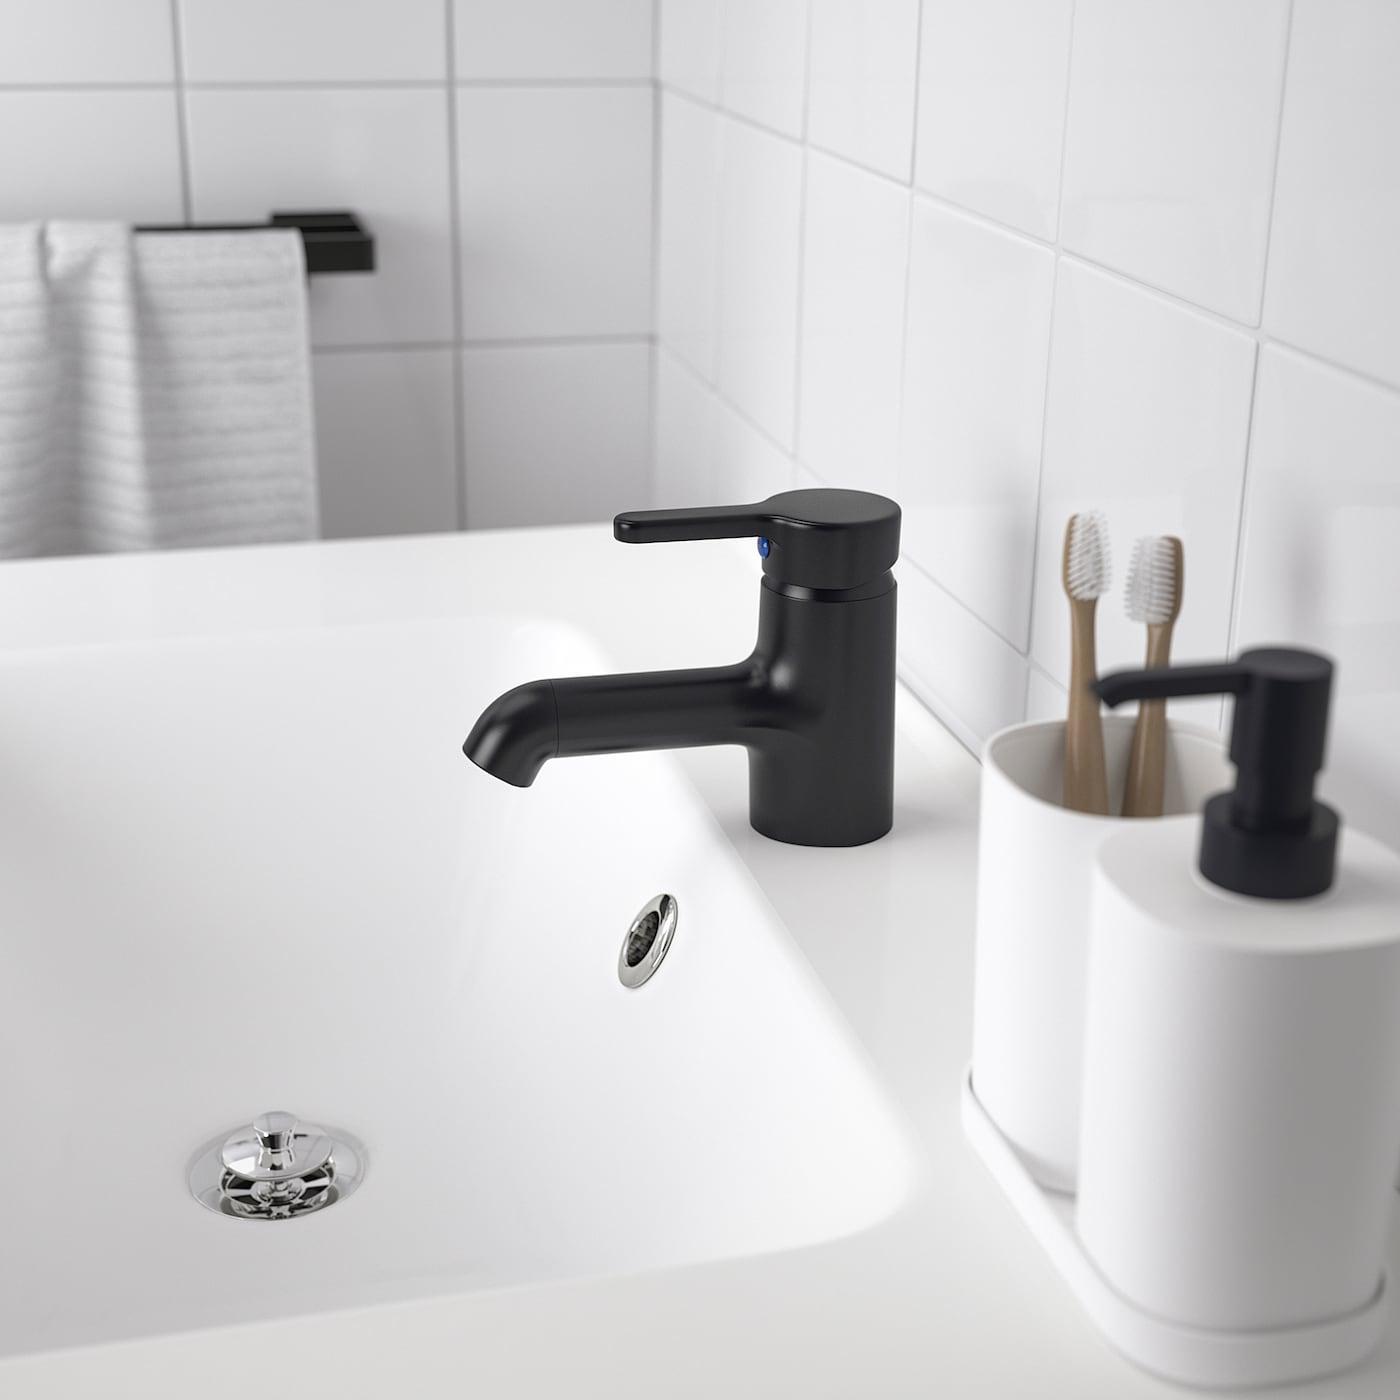 Saljen Wastafelmengkraan Zwart Ikea